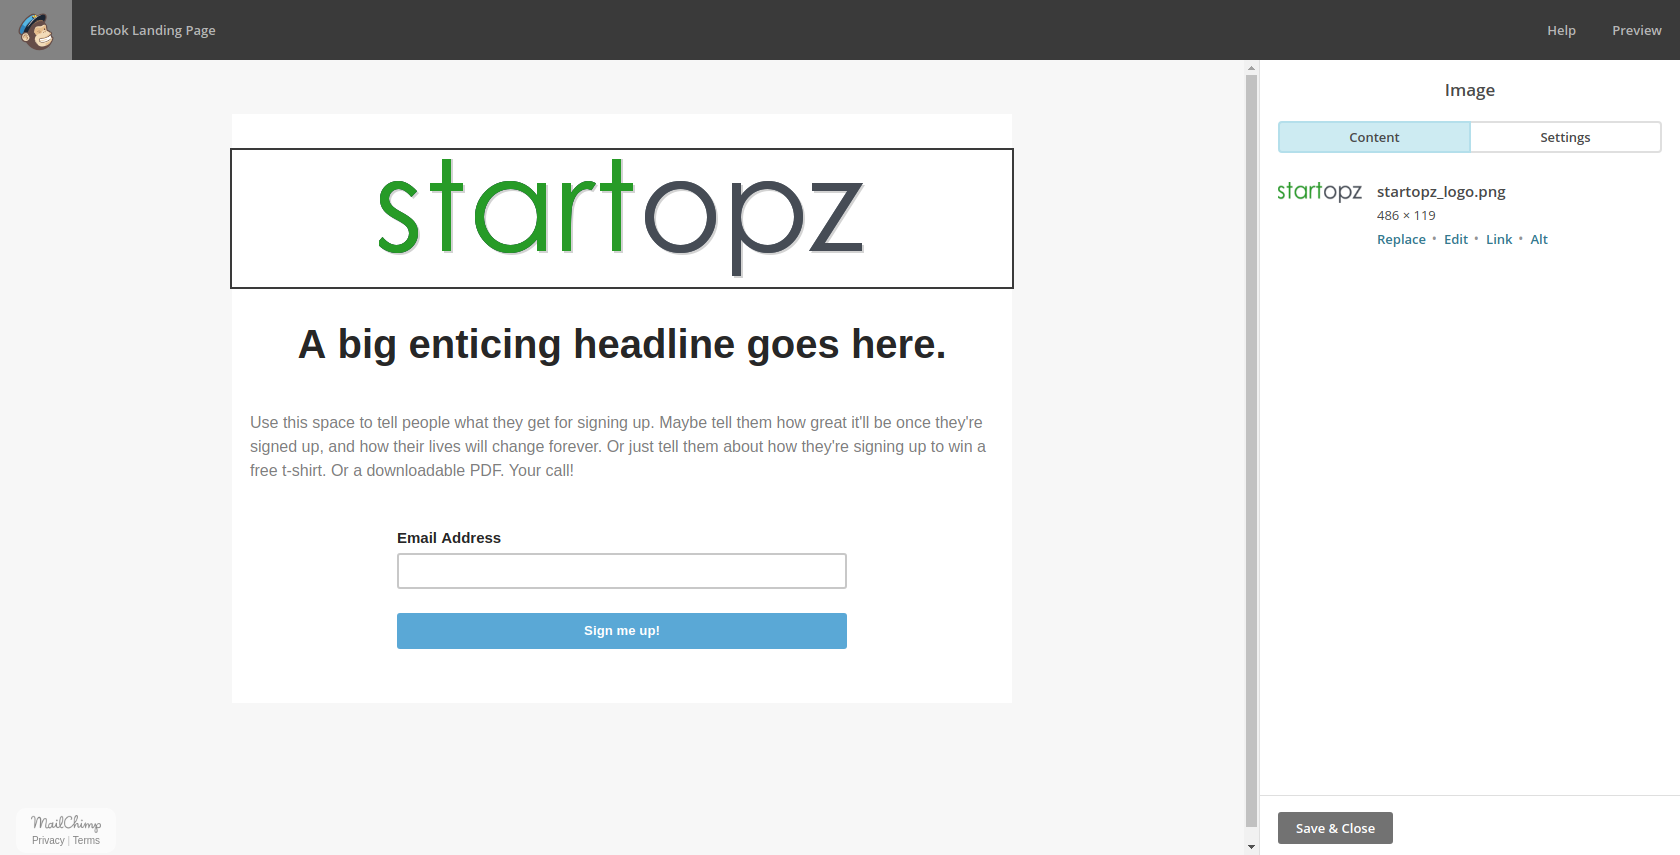 Adding a landing page logo